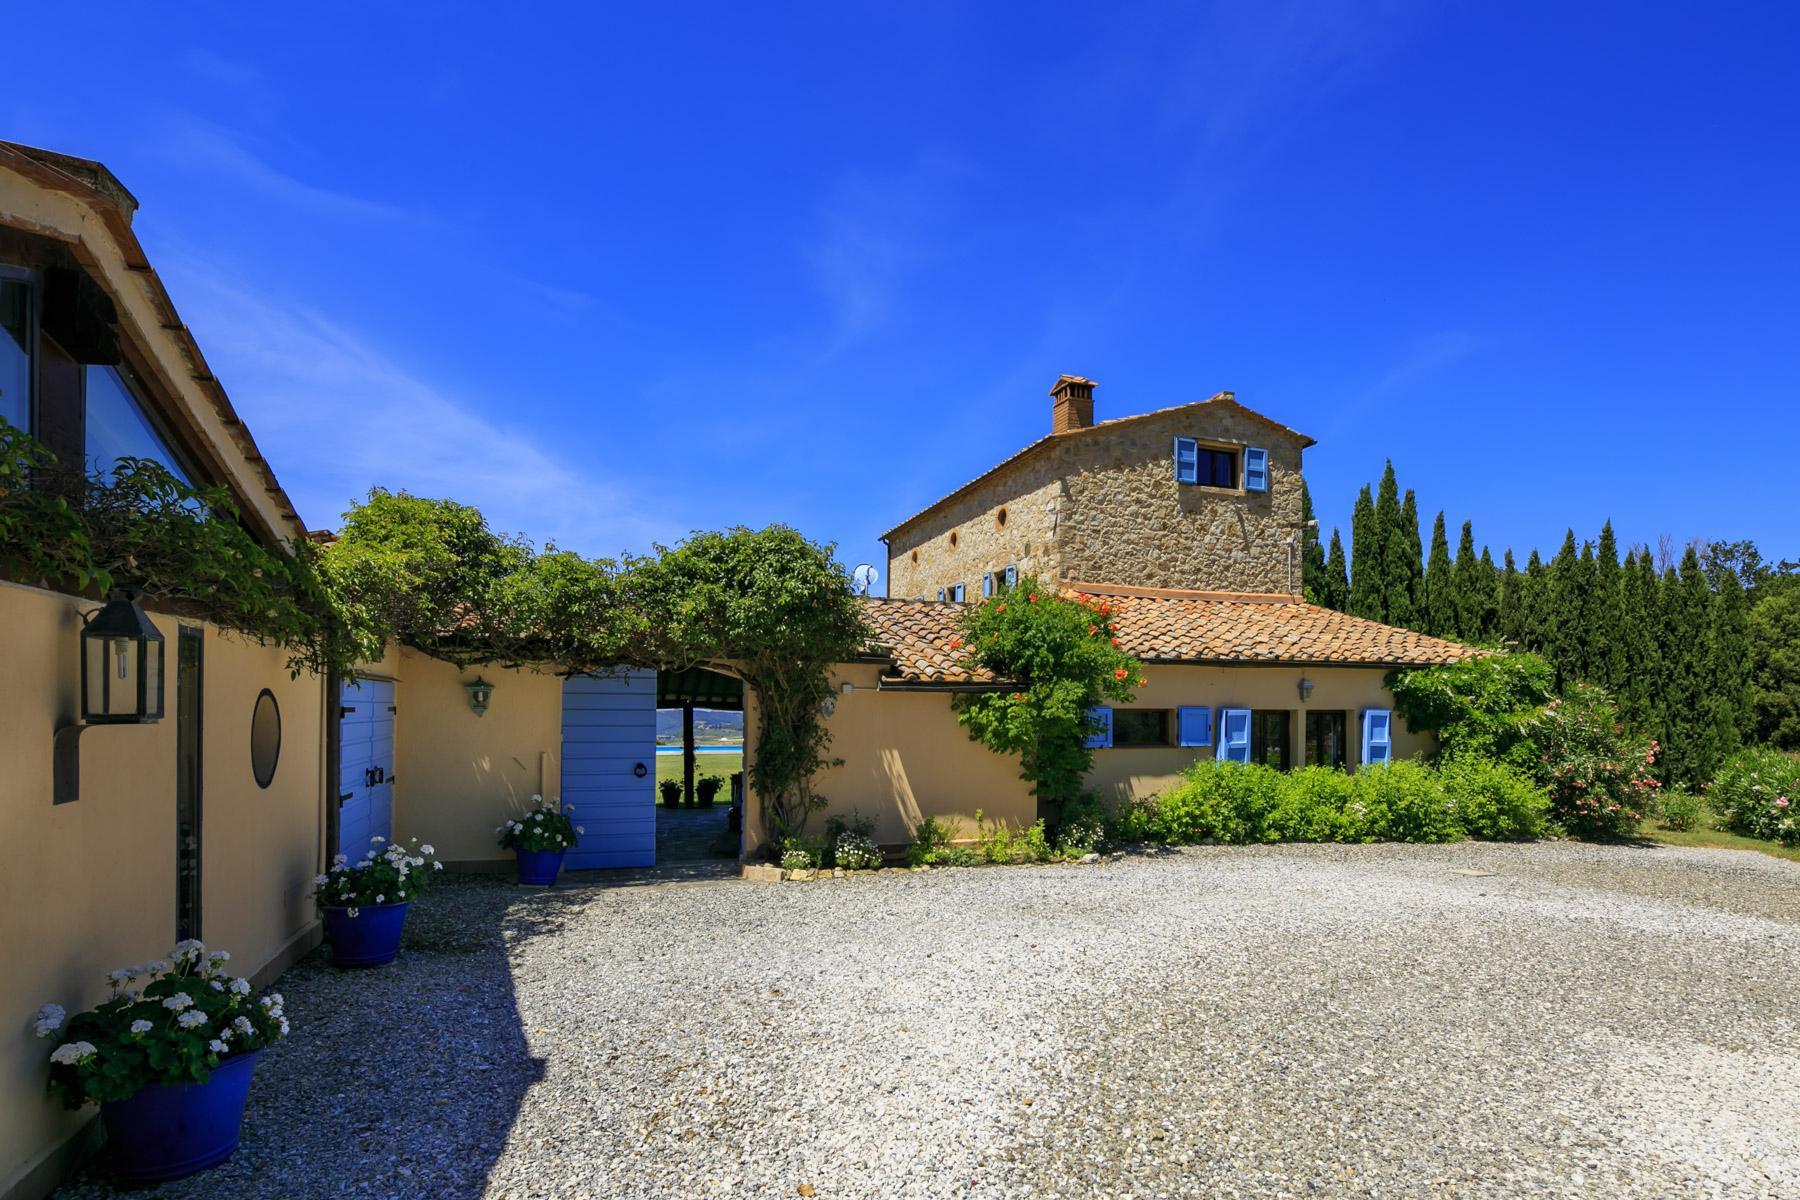 Belle villa toscane avec piscine - 26